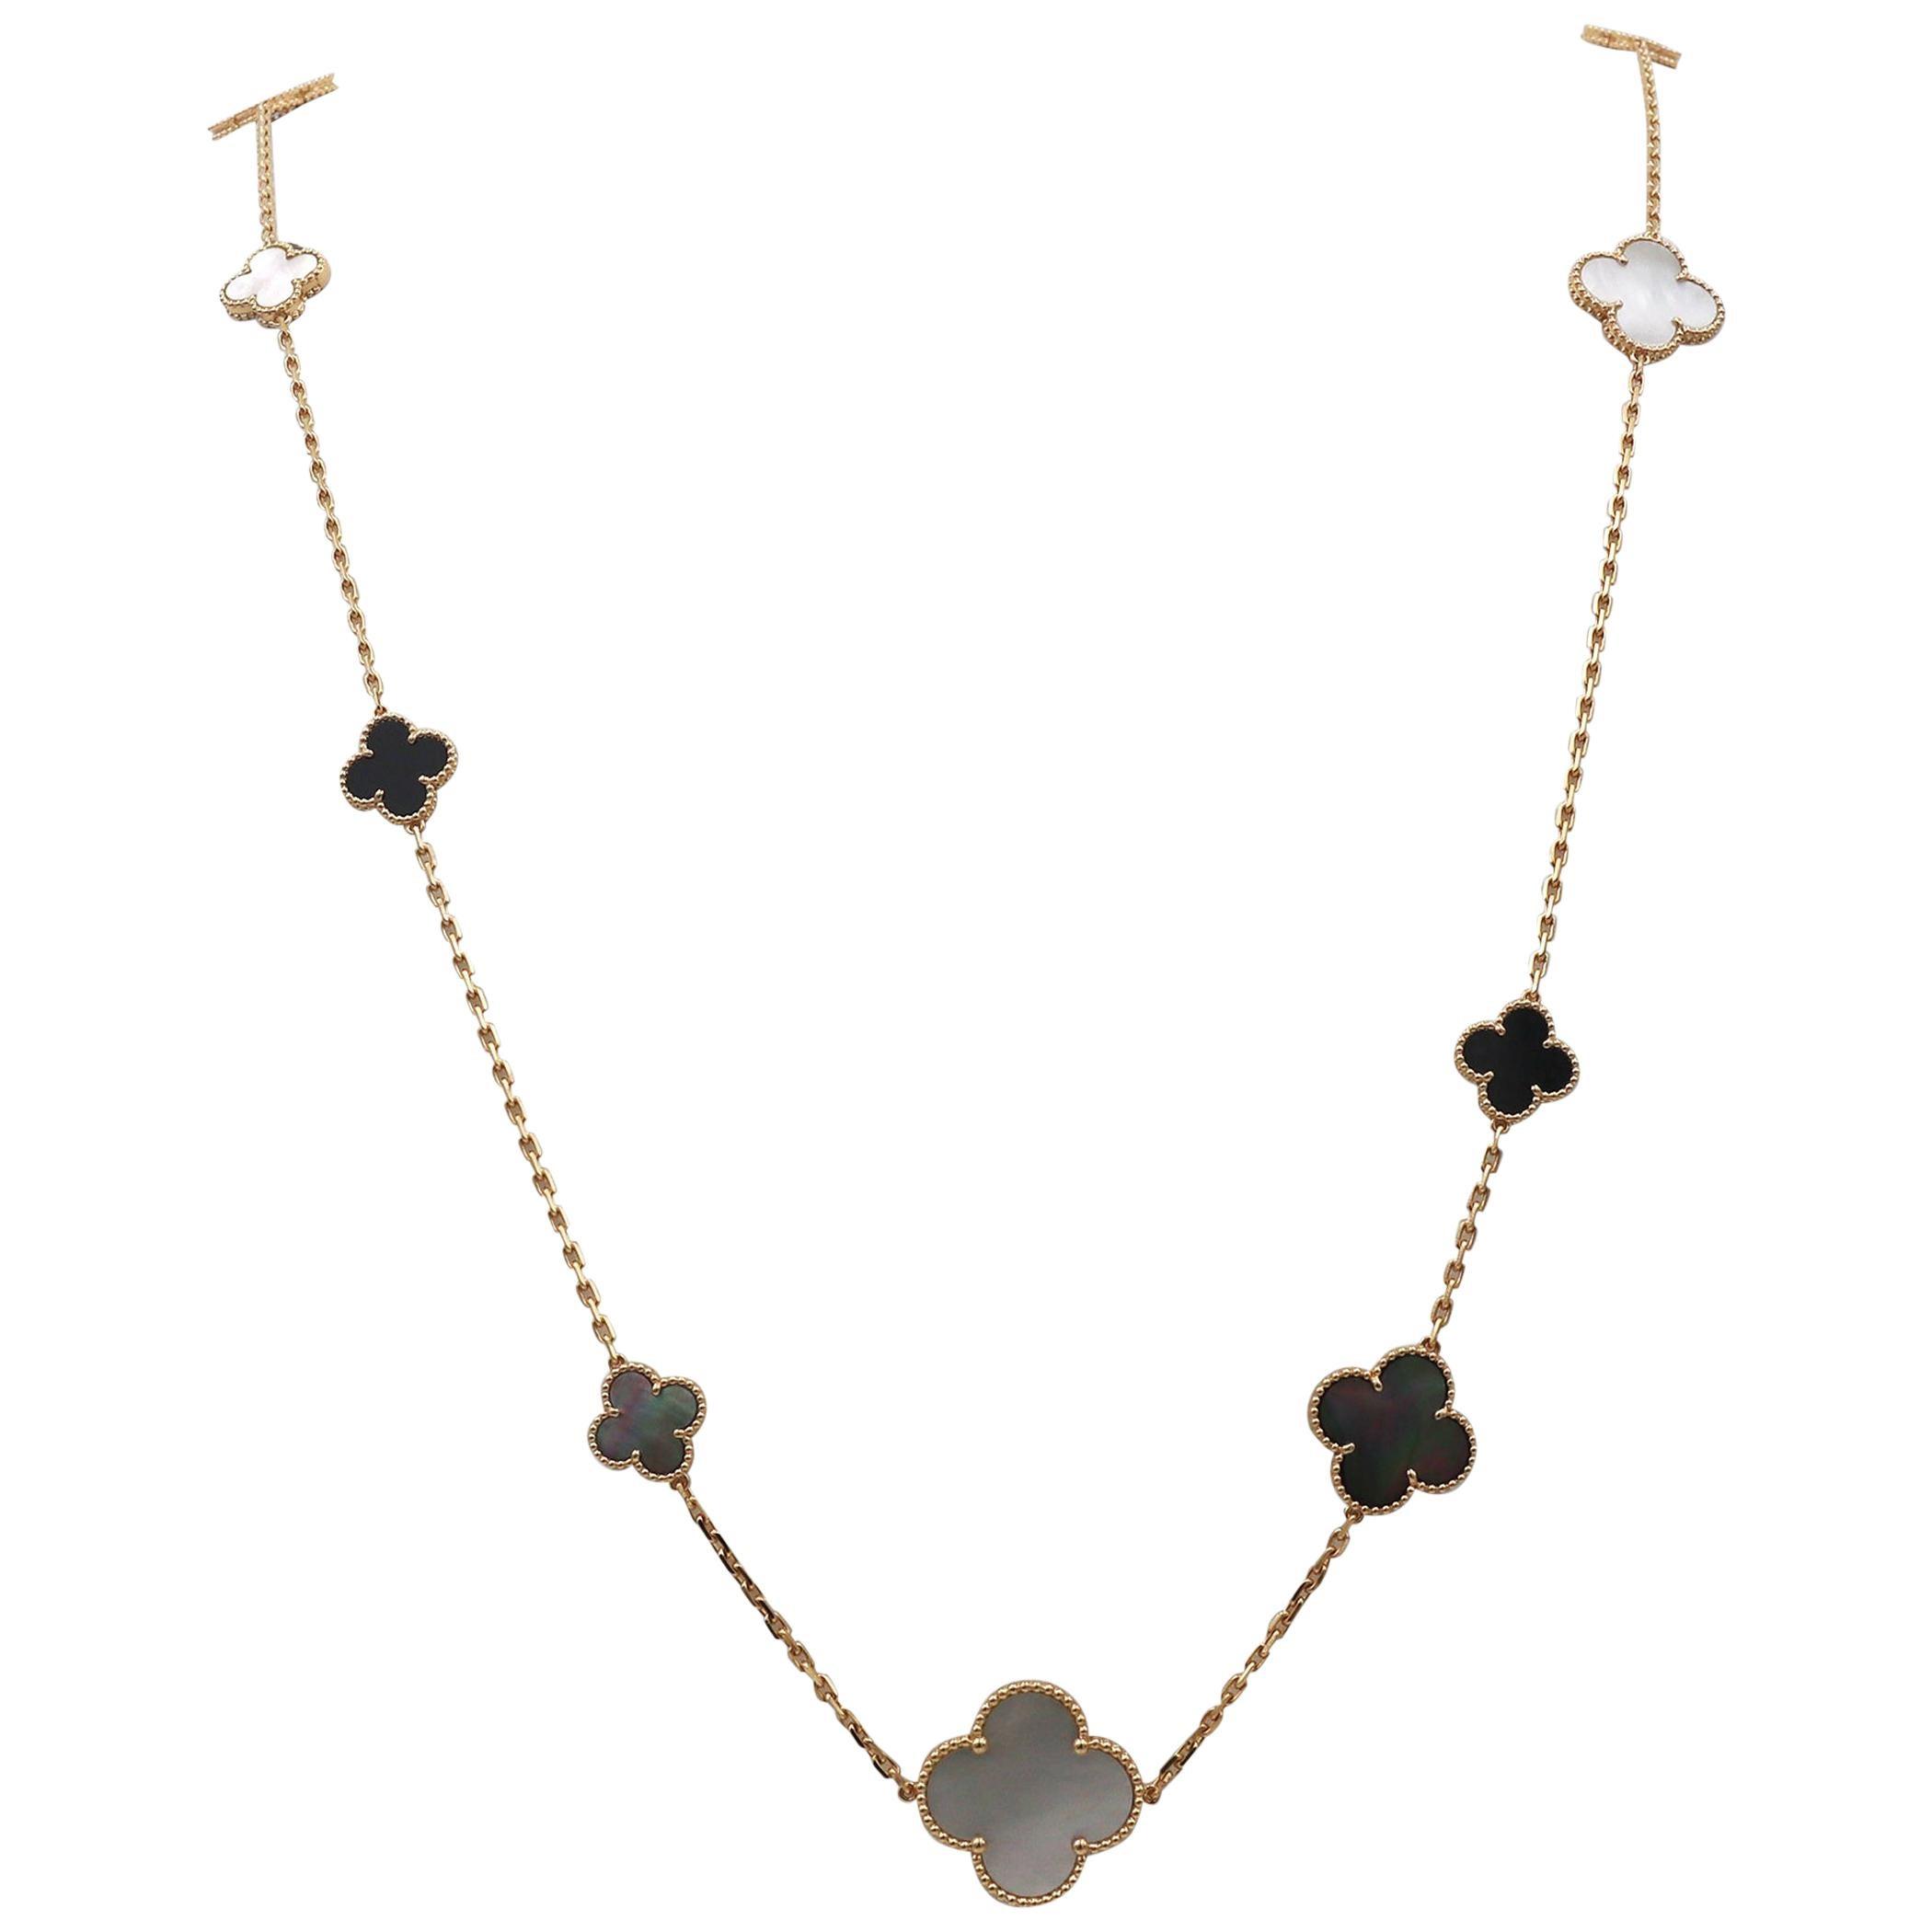 Van Cleef & Arpels Magic Alhambra 16 Motif Long Necklace